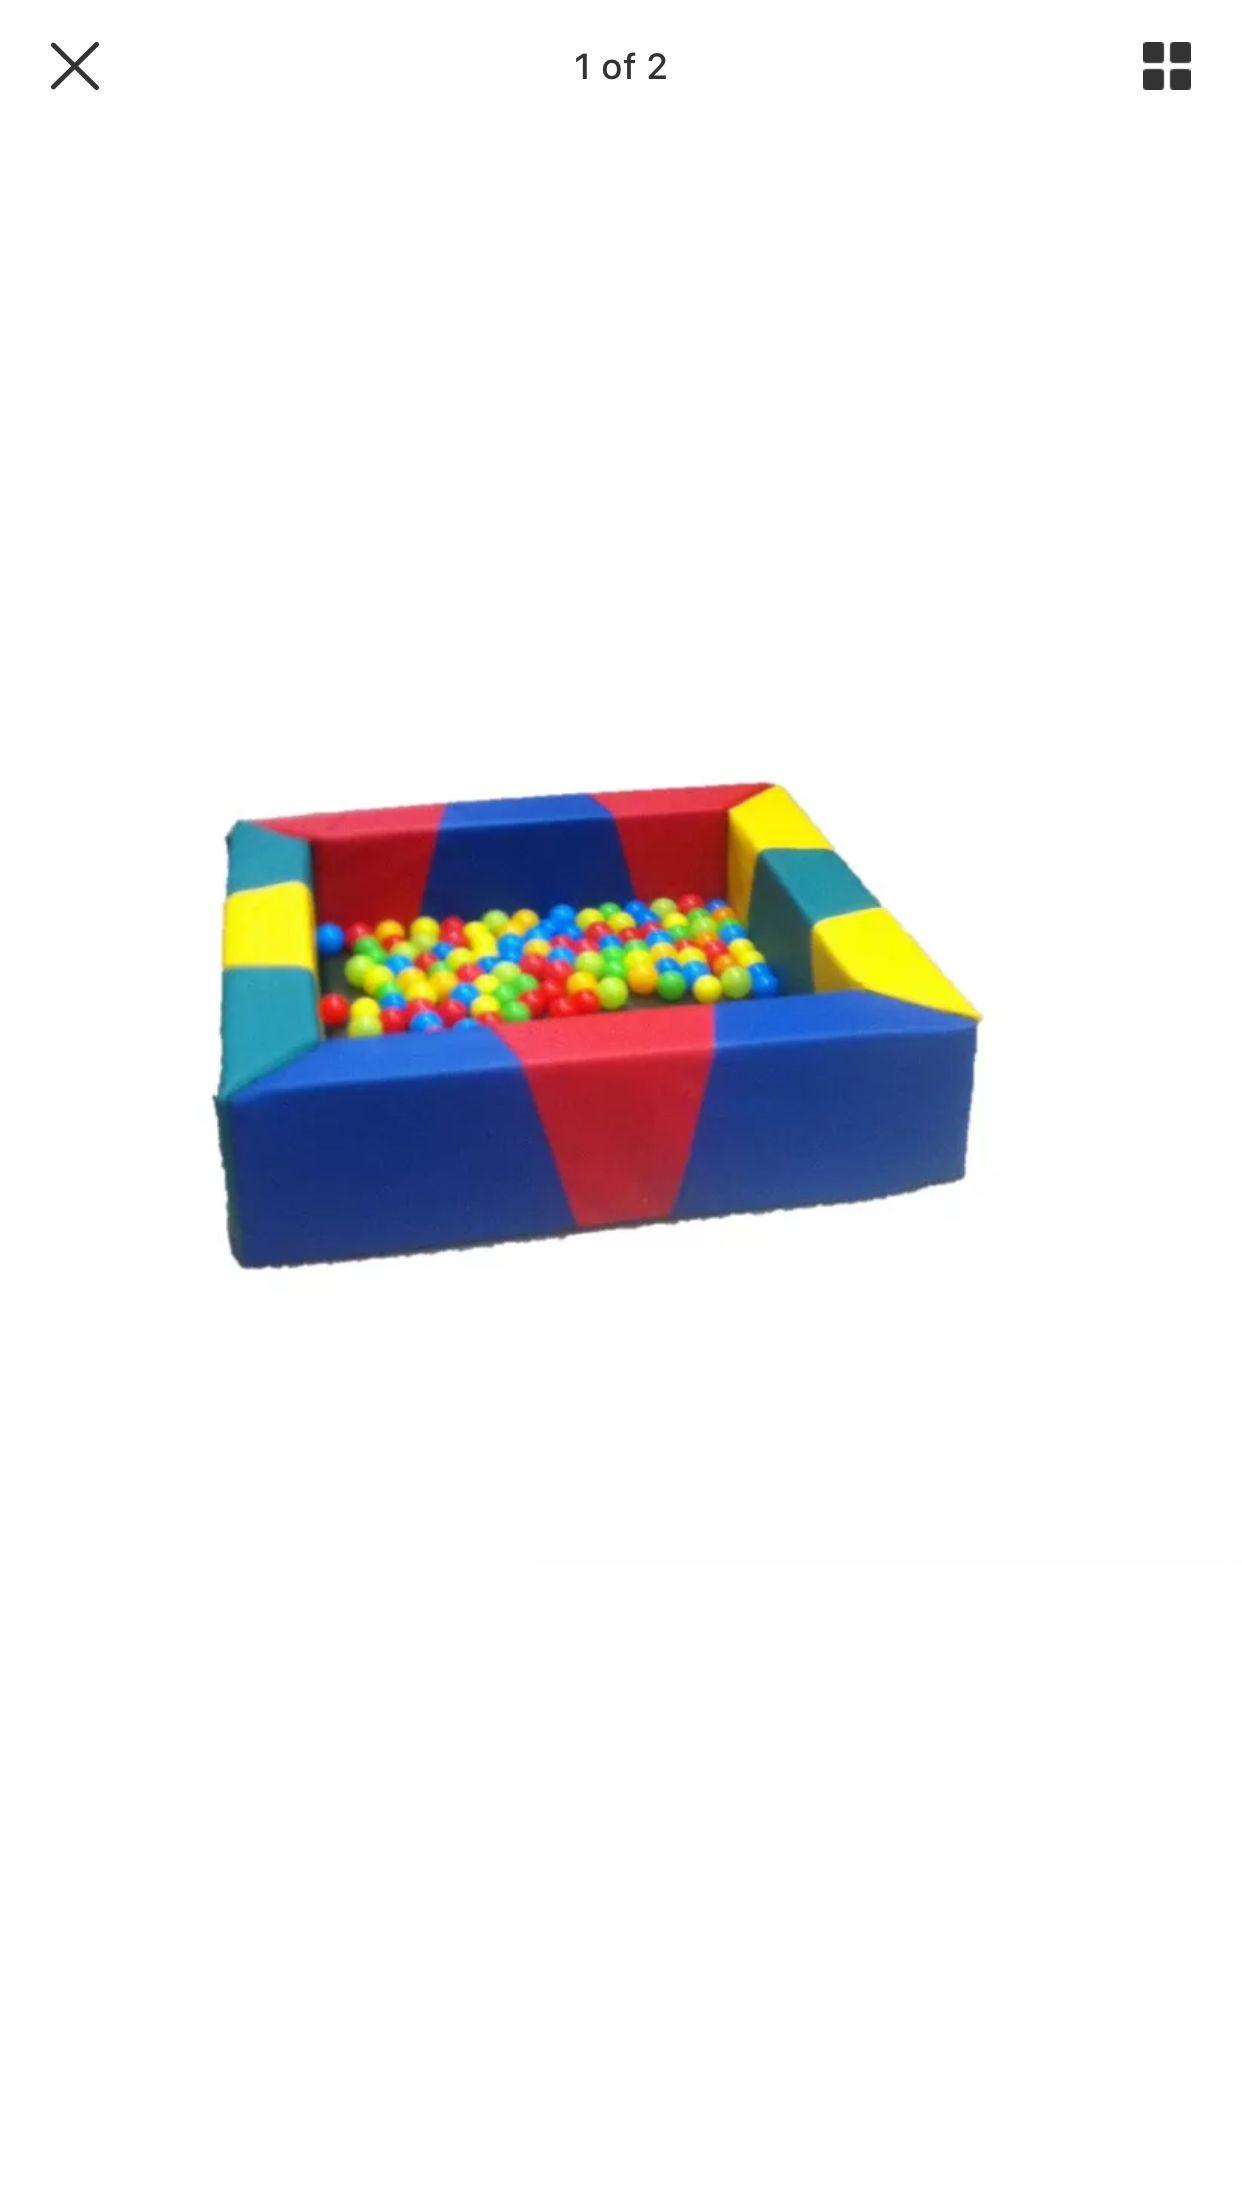 Softplay Toys R us PVC Foam Children s MultiColoured pattern